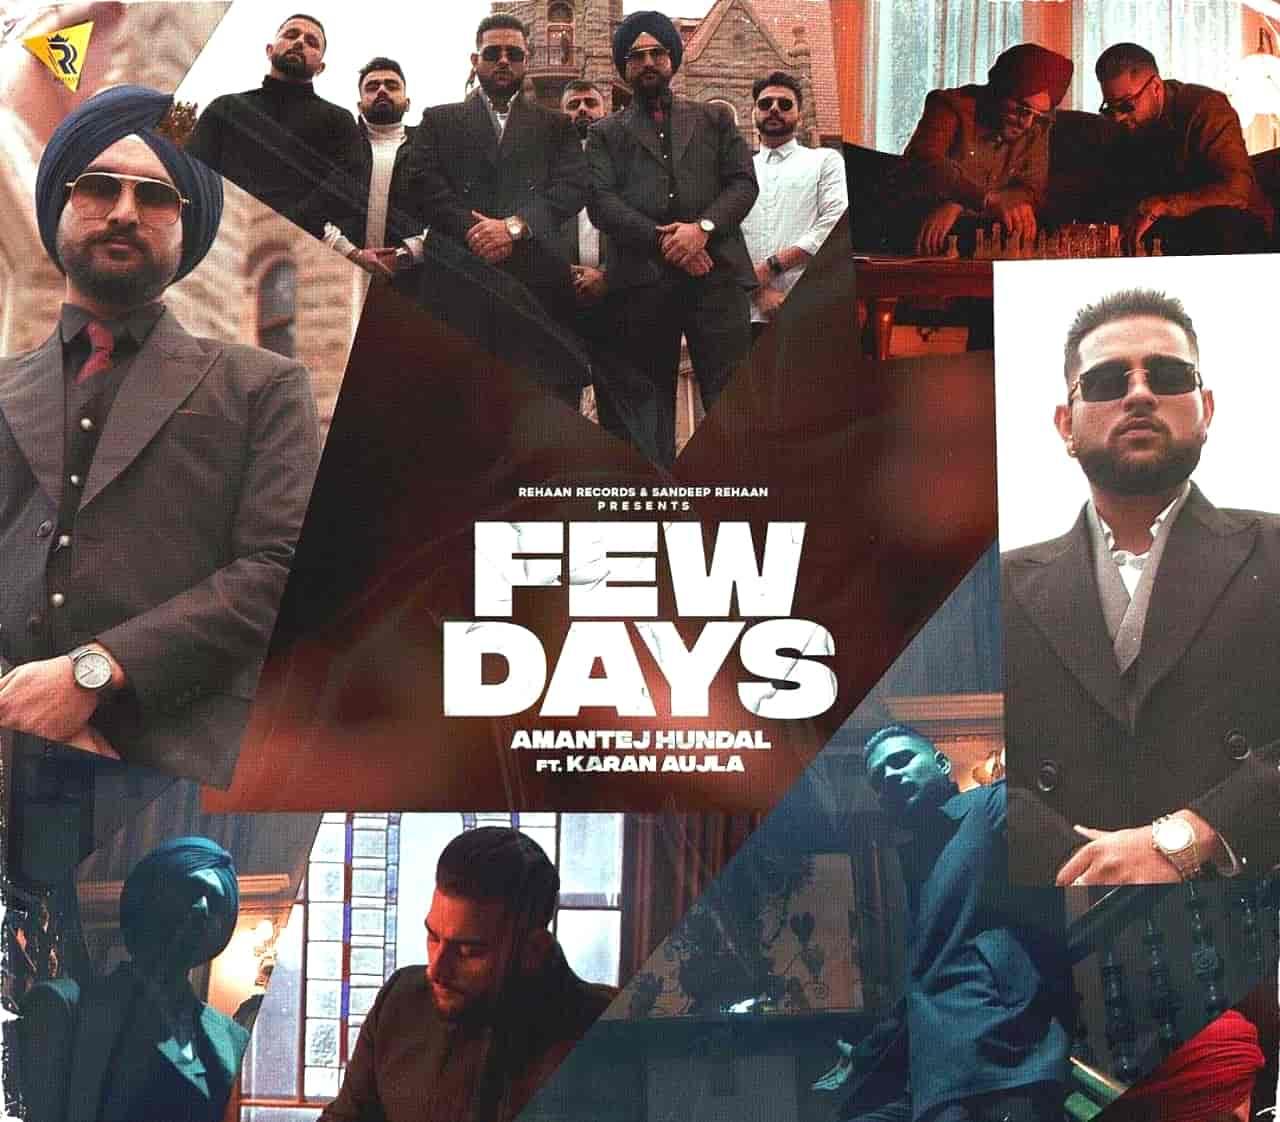 Few Days Punjabi Song Lyrics Karan Aujla